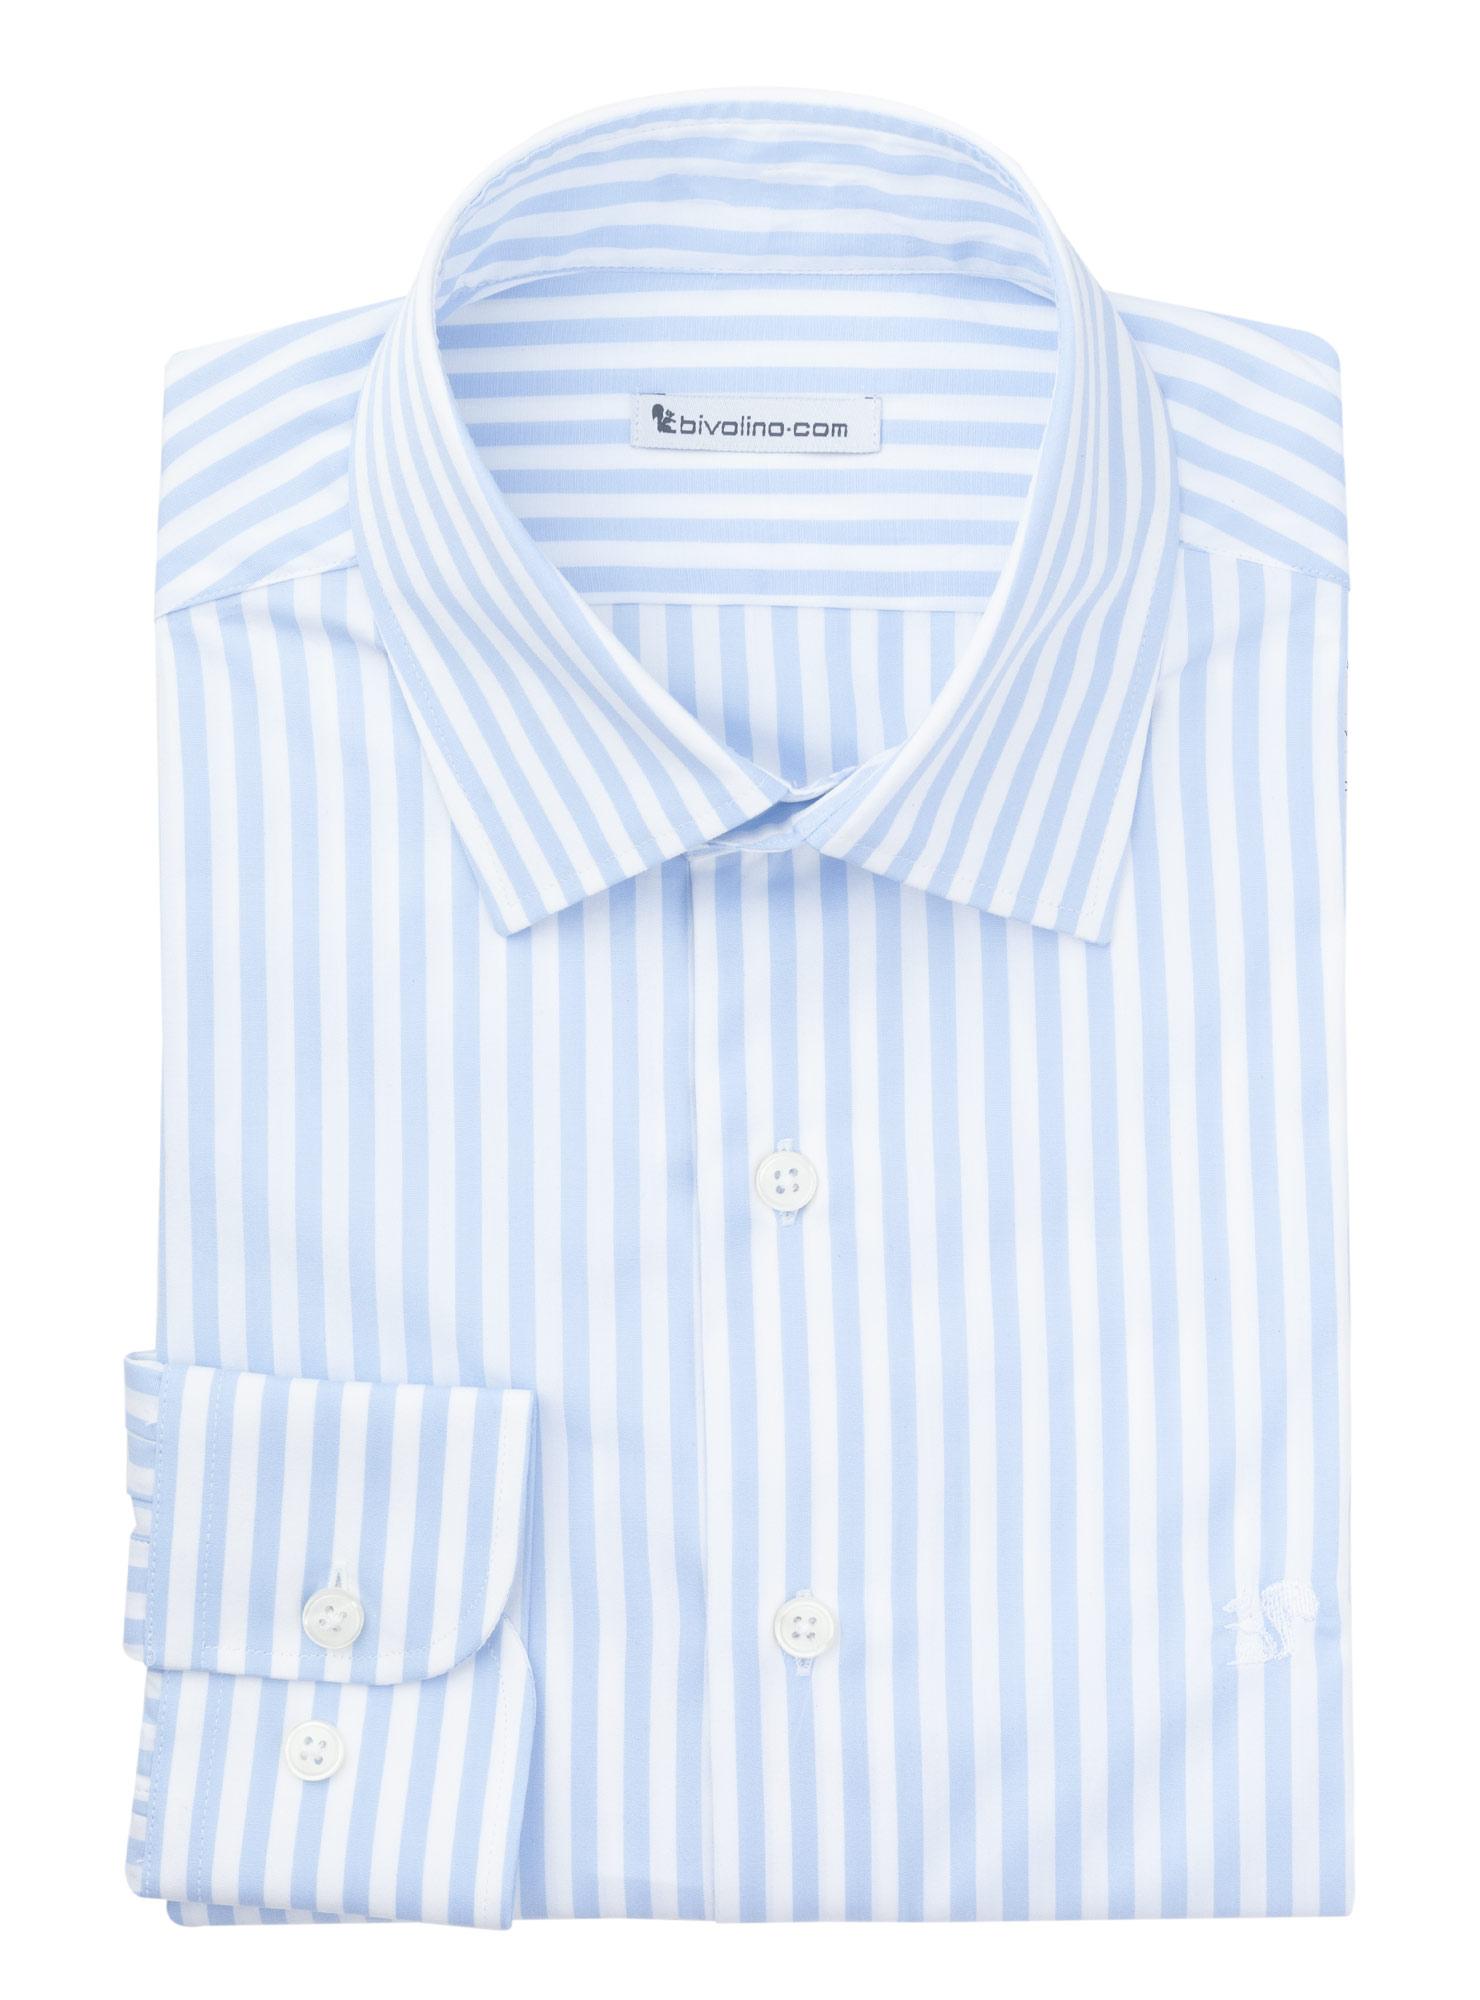 FOGGIA - chemise homme Popeline à rayures bleu - WINDY 2